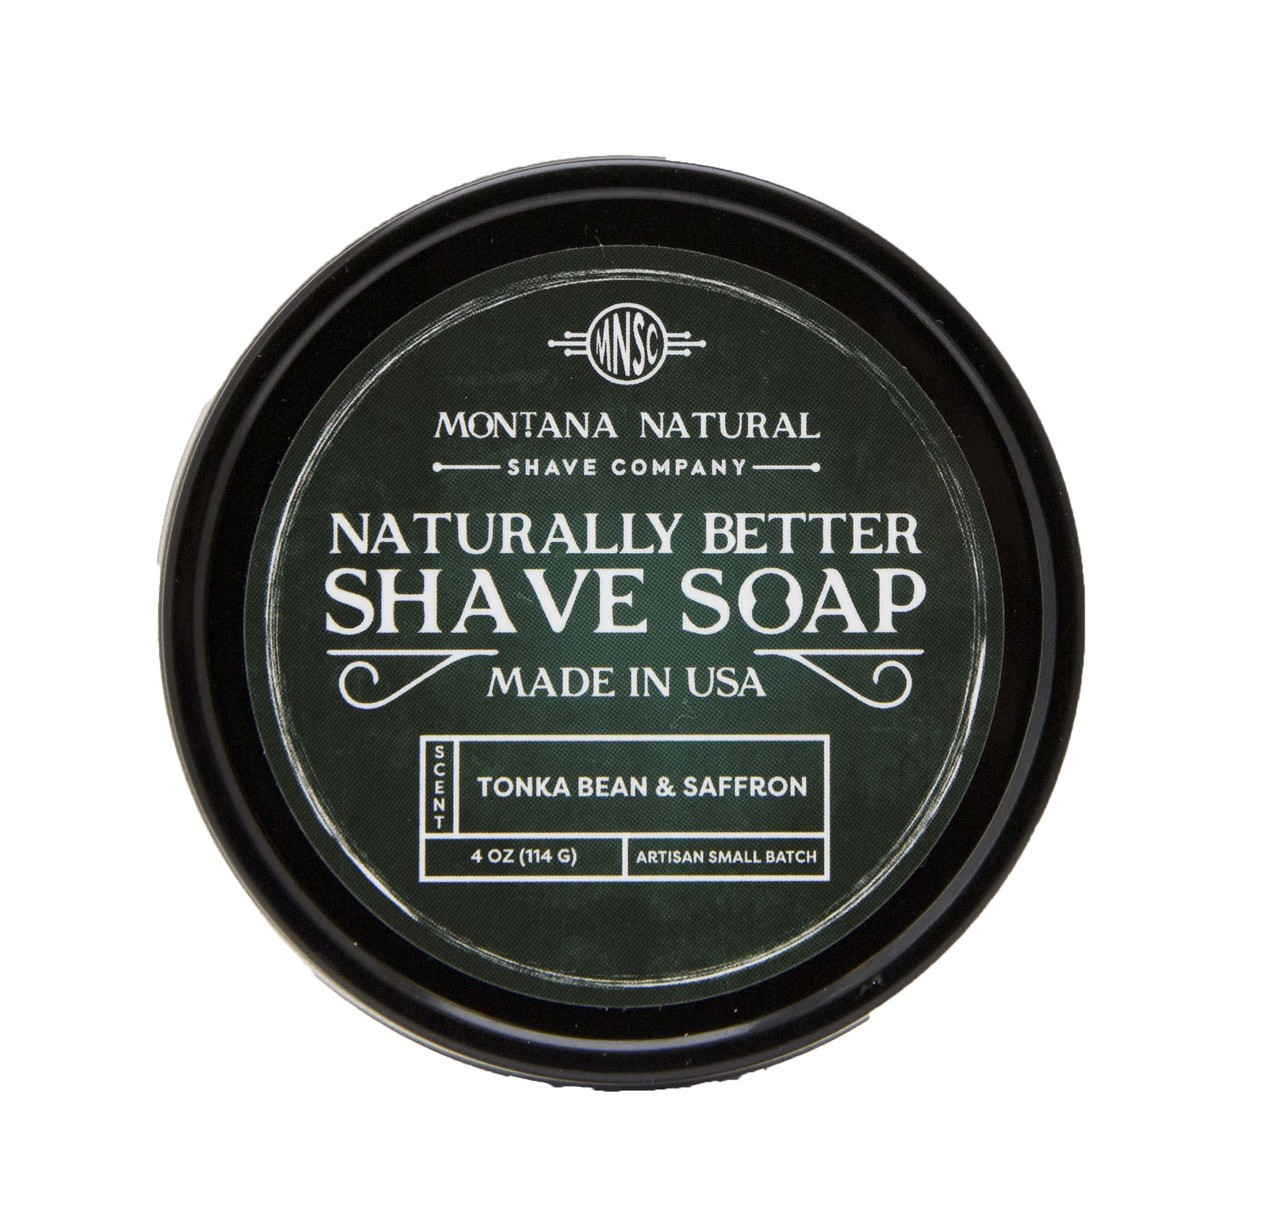 Tonka Bean & Saffron Artisian Small Batch Shave Soap for a Naturally Better Shave Experience